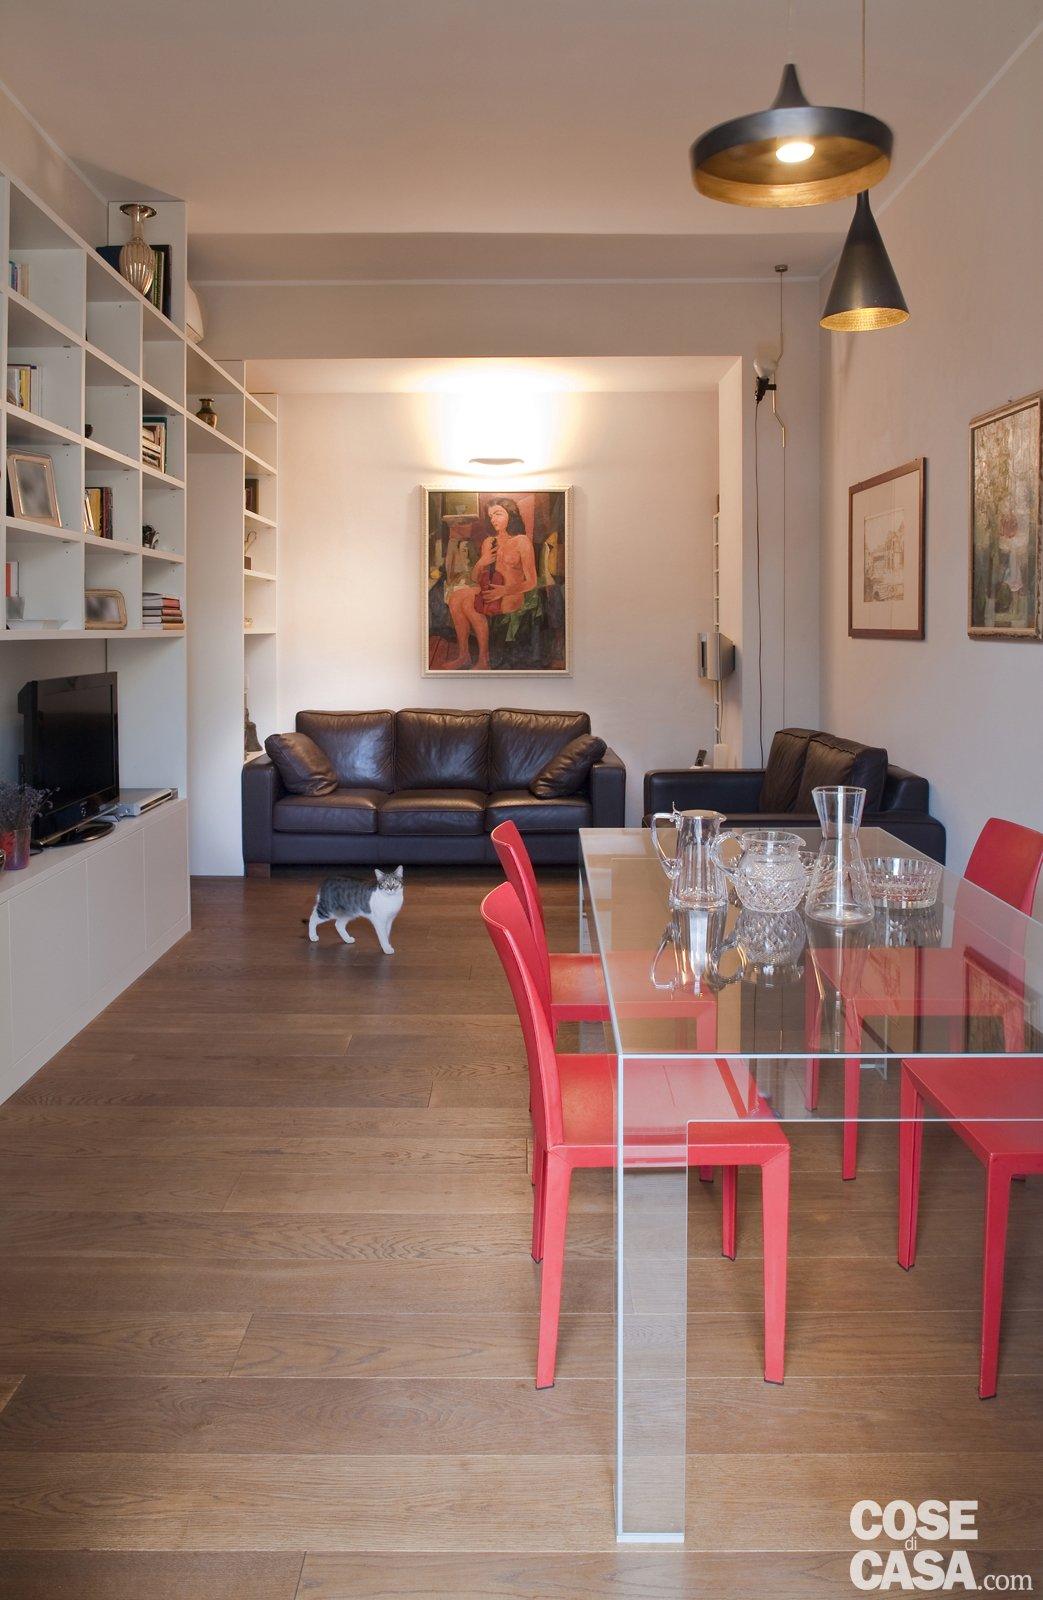 Una casa di 80 mq superfunzionali cose di casa - Ristrutturare casa costi al mq ...